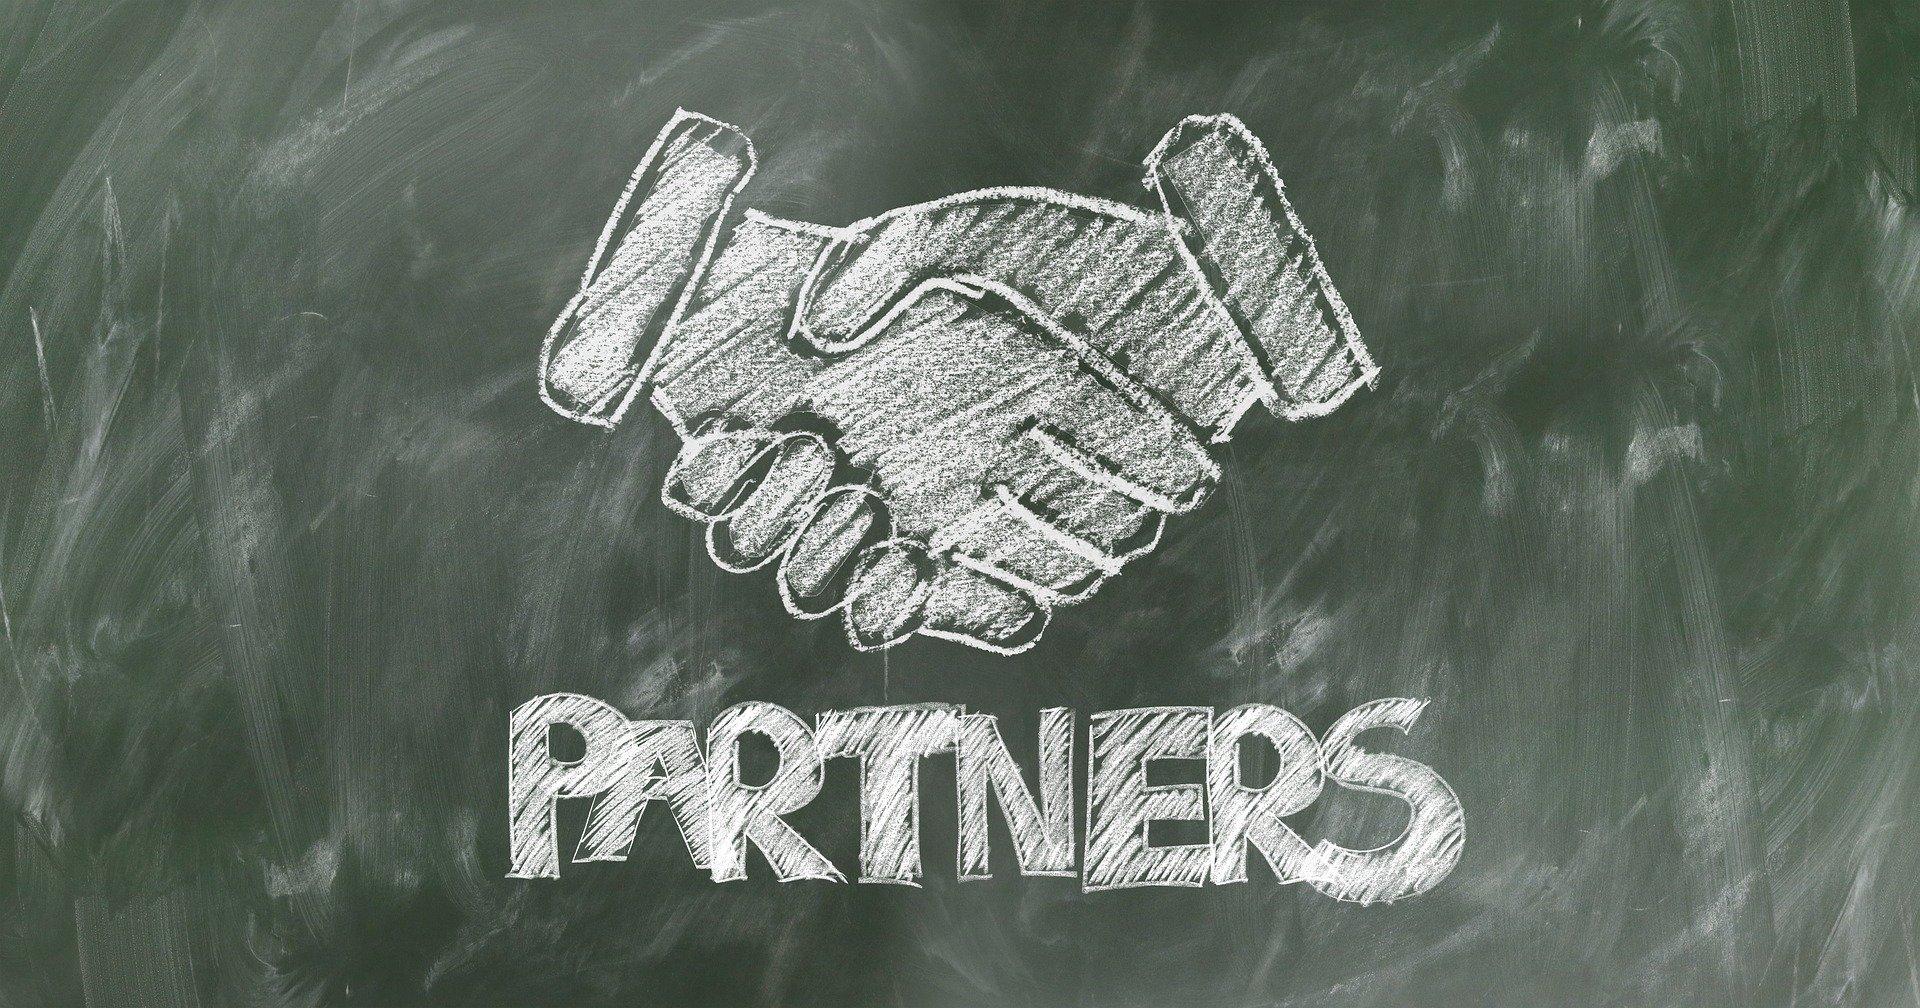 Partenariats avec Oniris